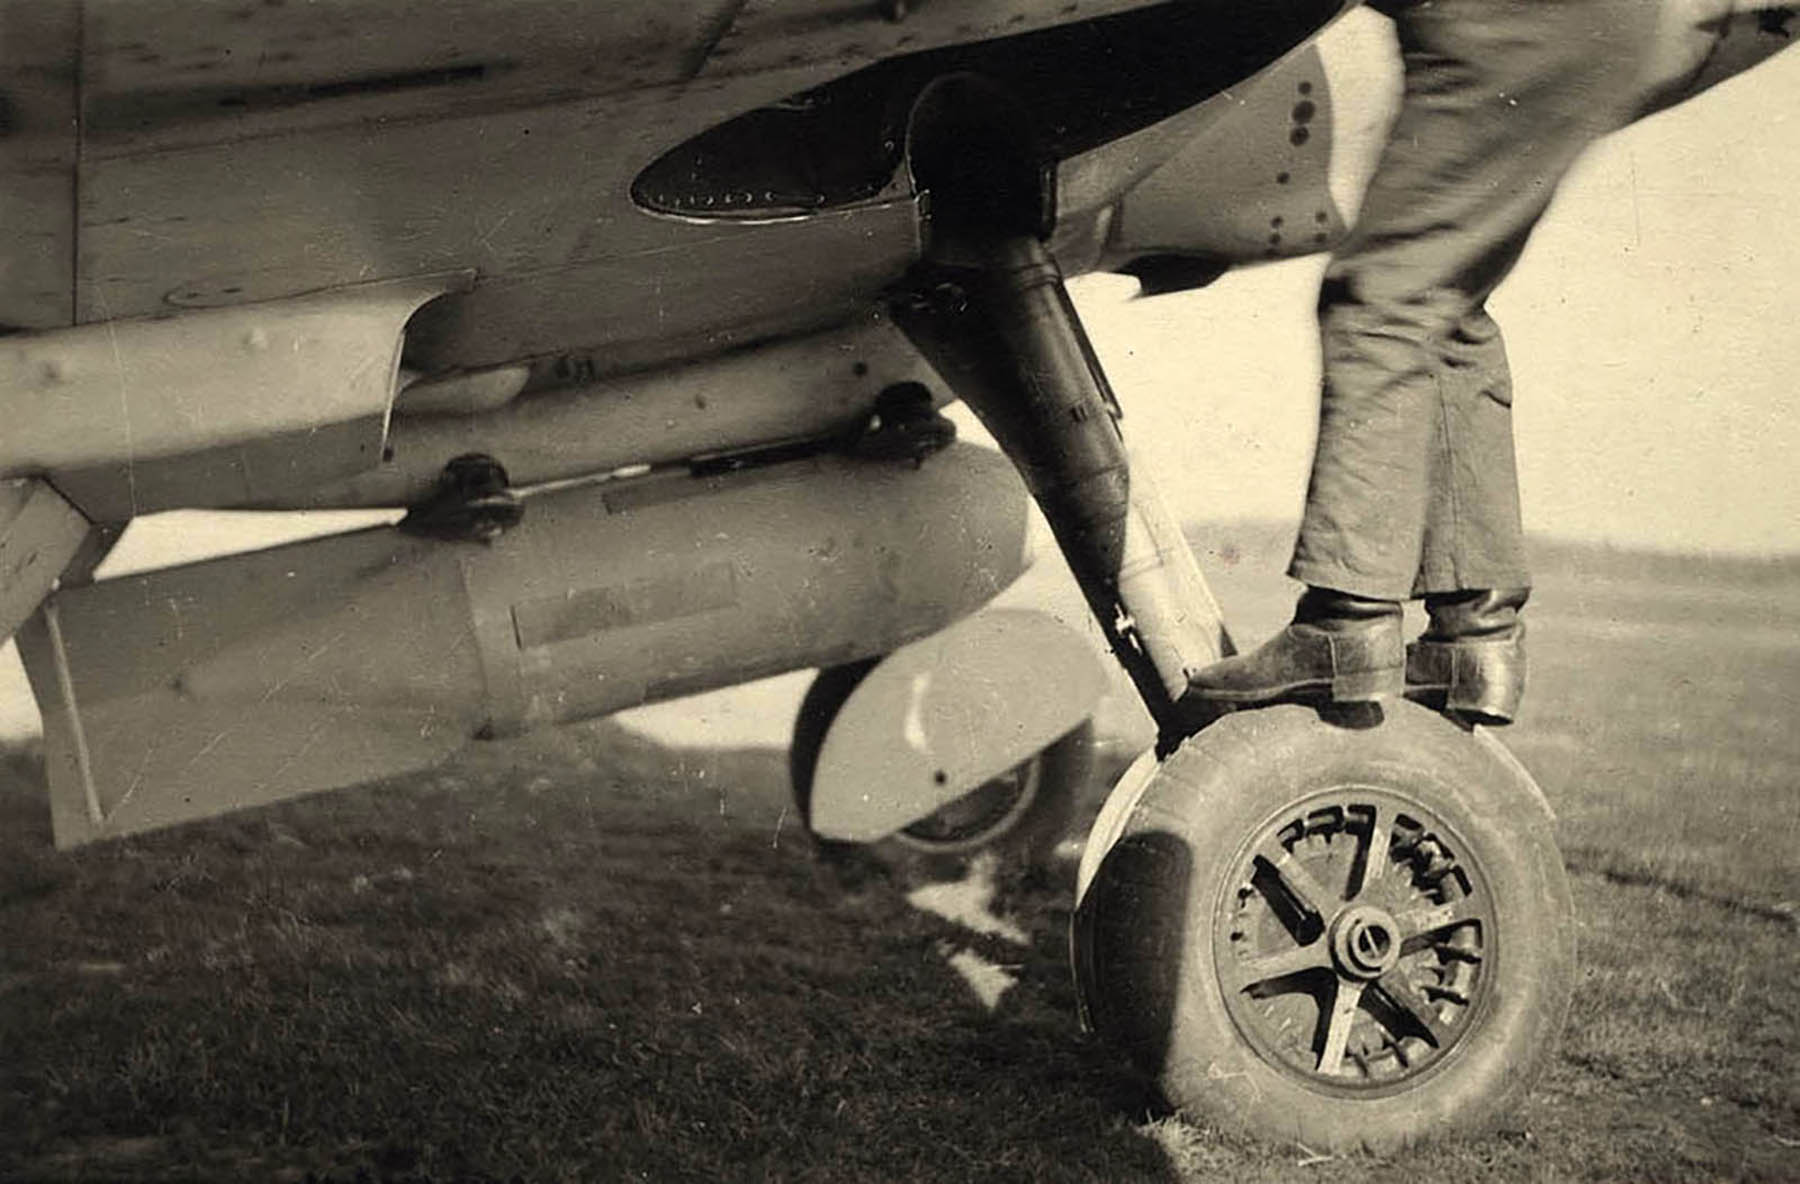 Spitfire RAF 132 Wing at Woensdrecht Holland 1945 NIMH 02